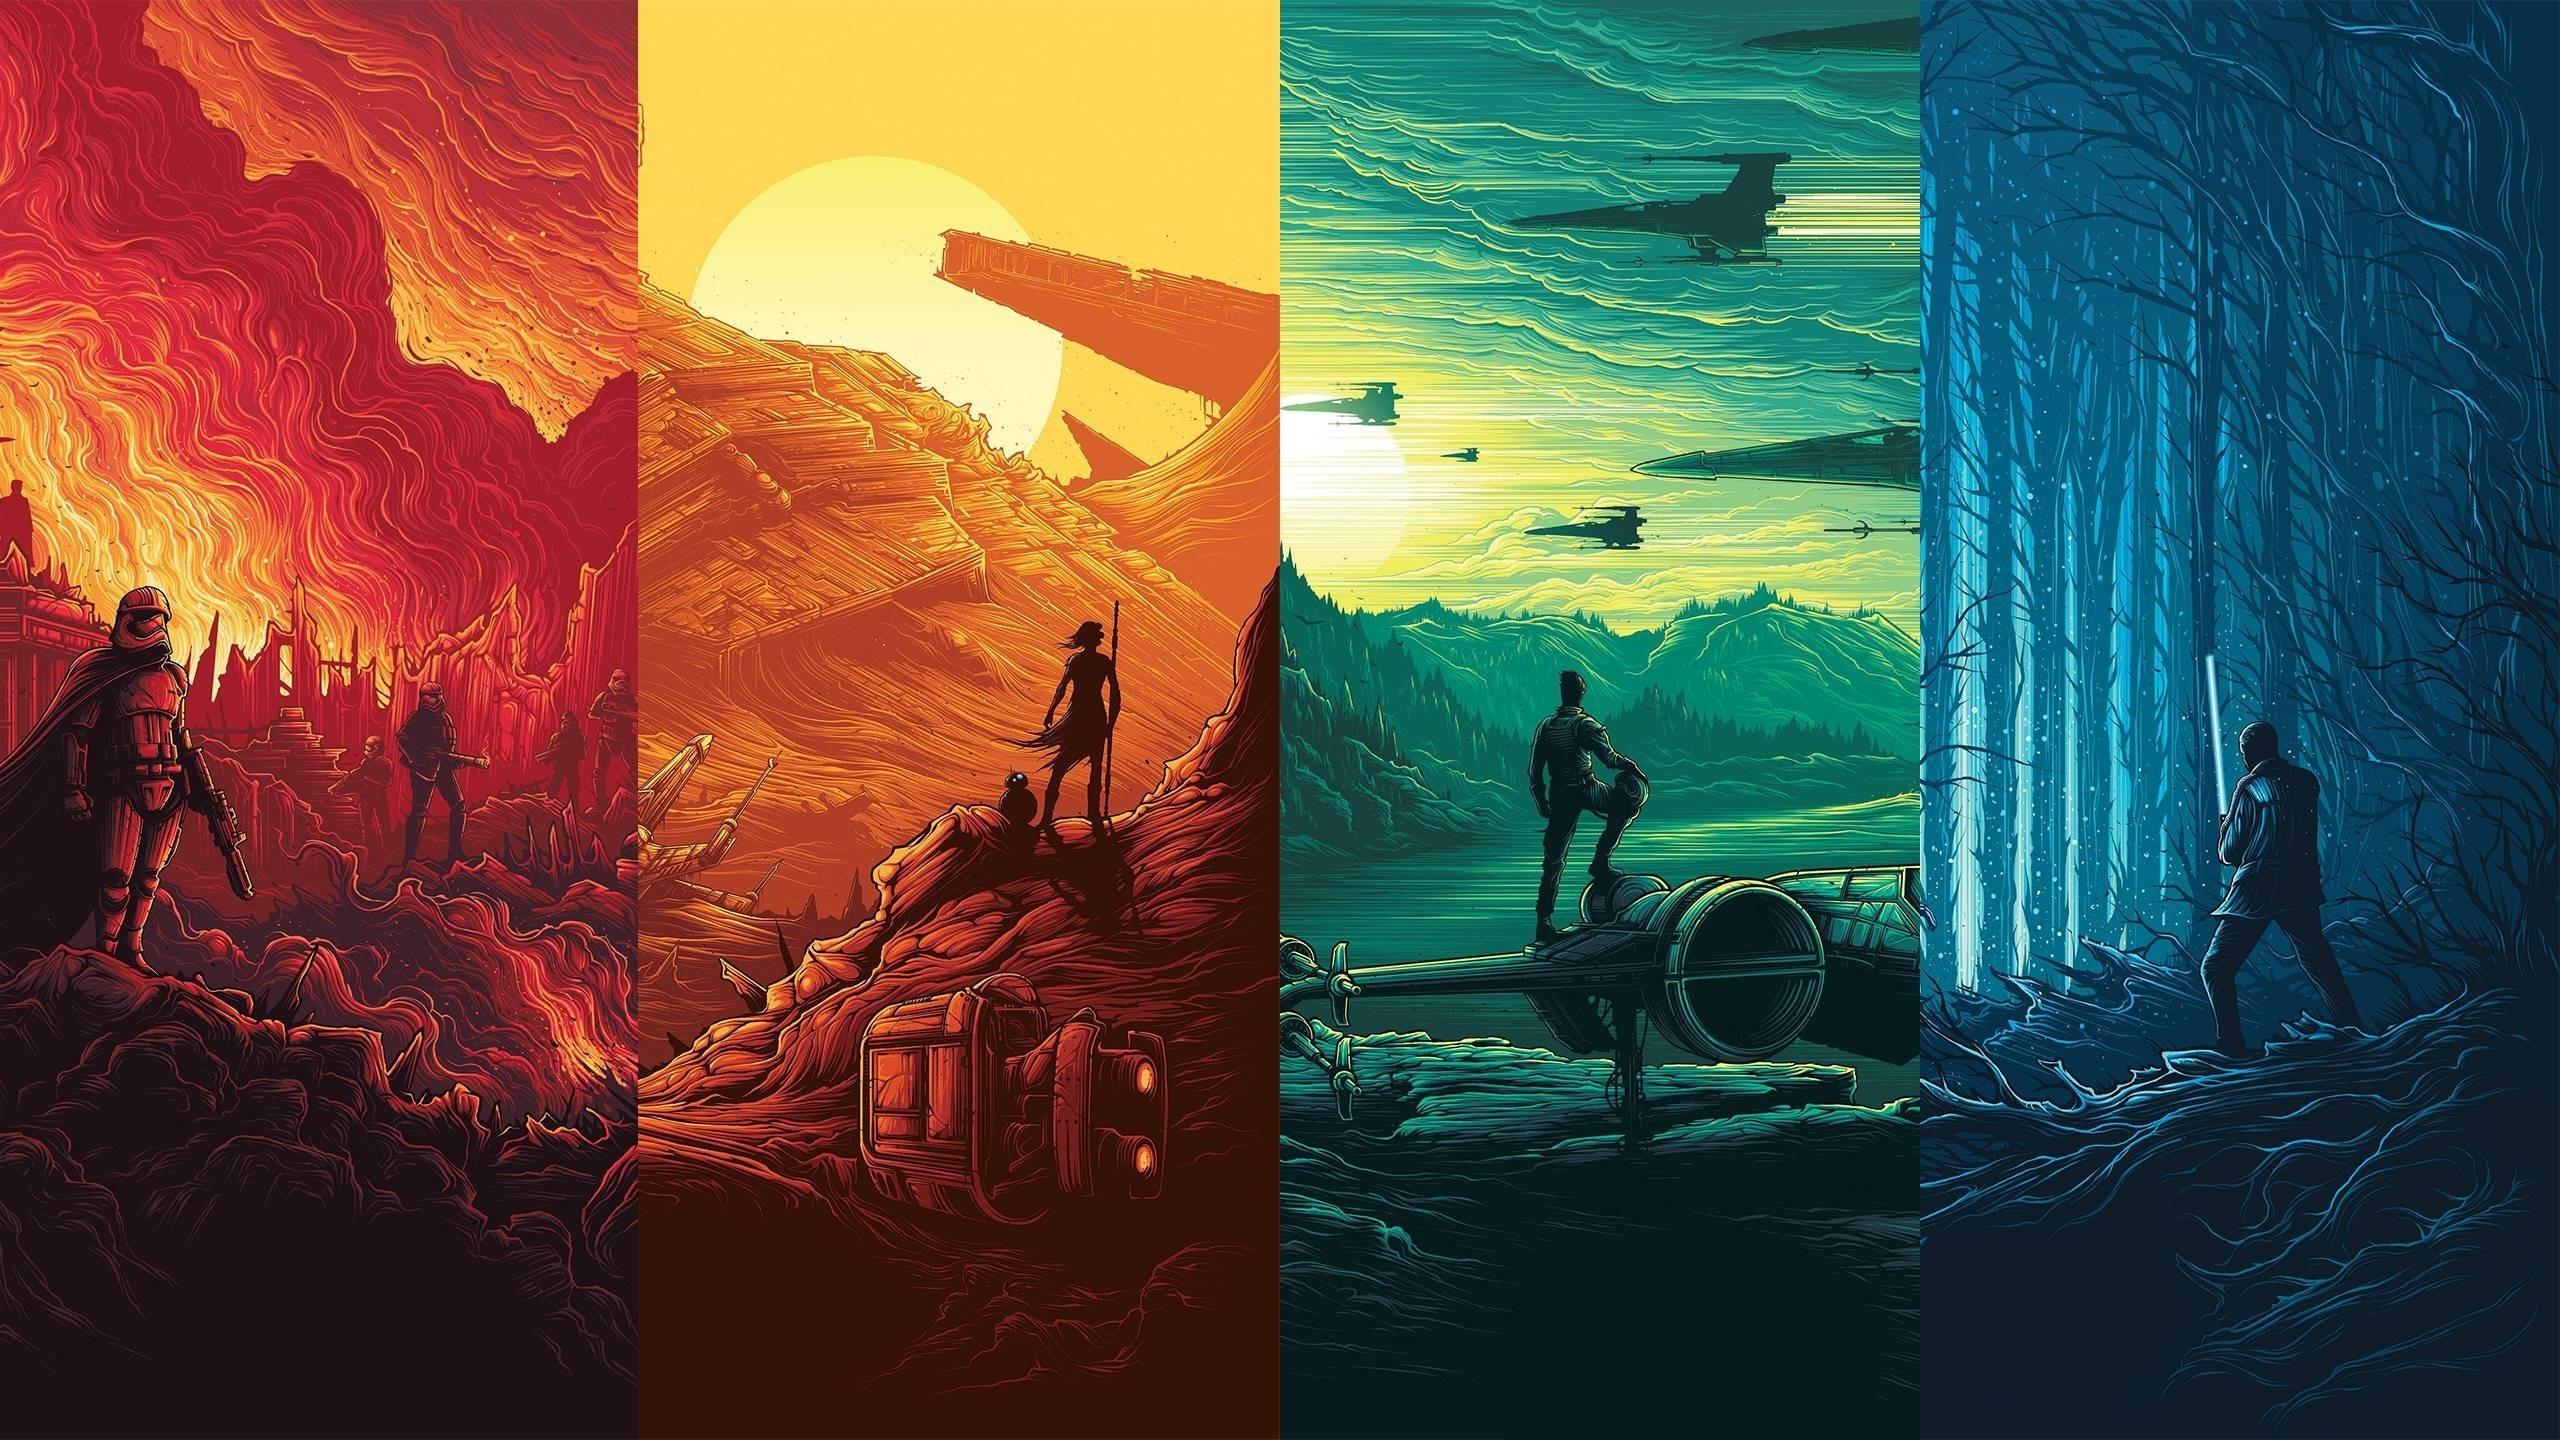 Star Wars Episode 7 Hd Wallpaper 64 Images